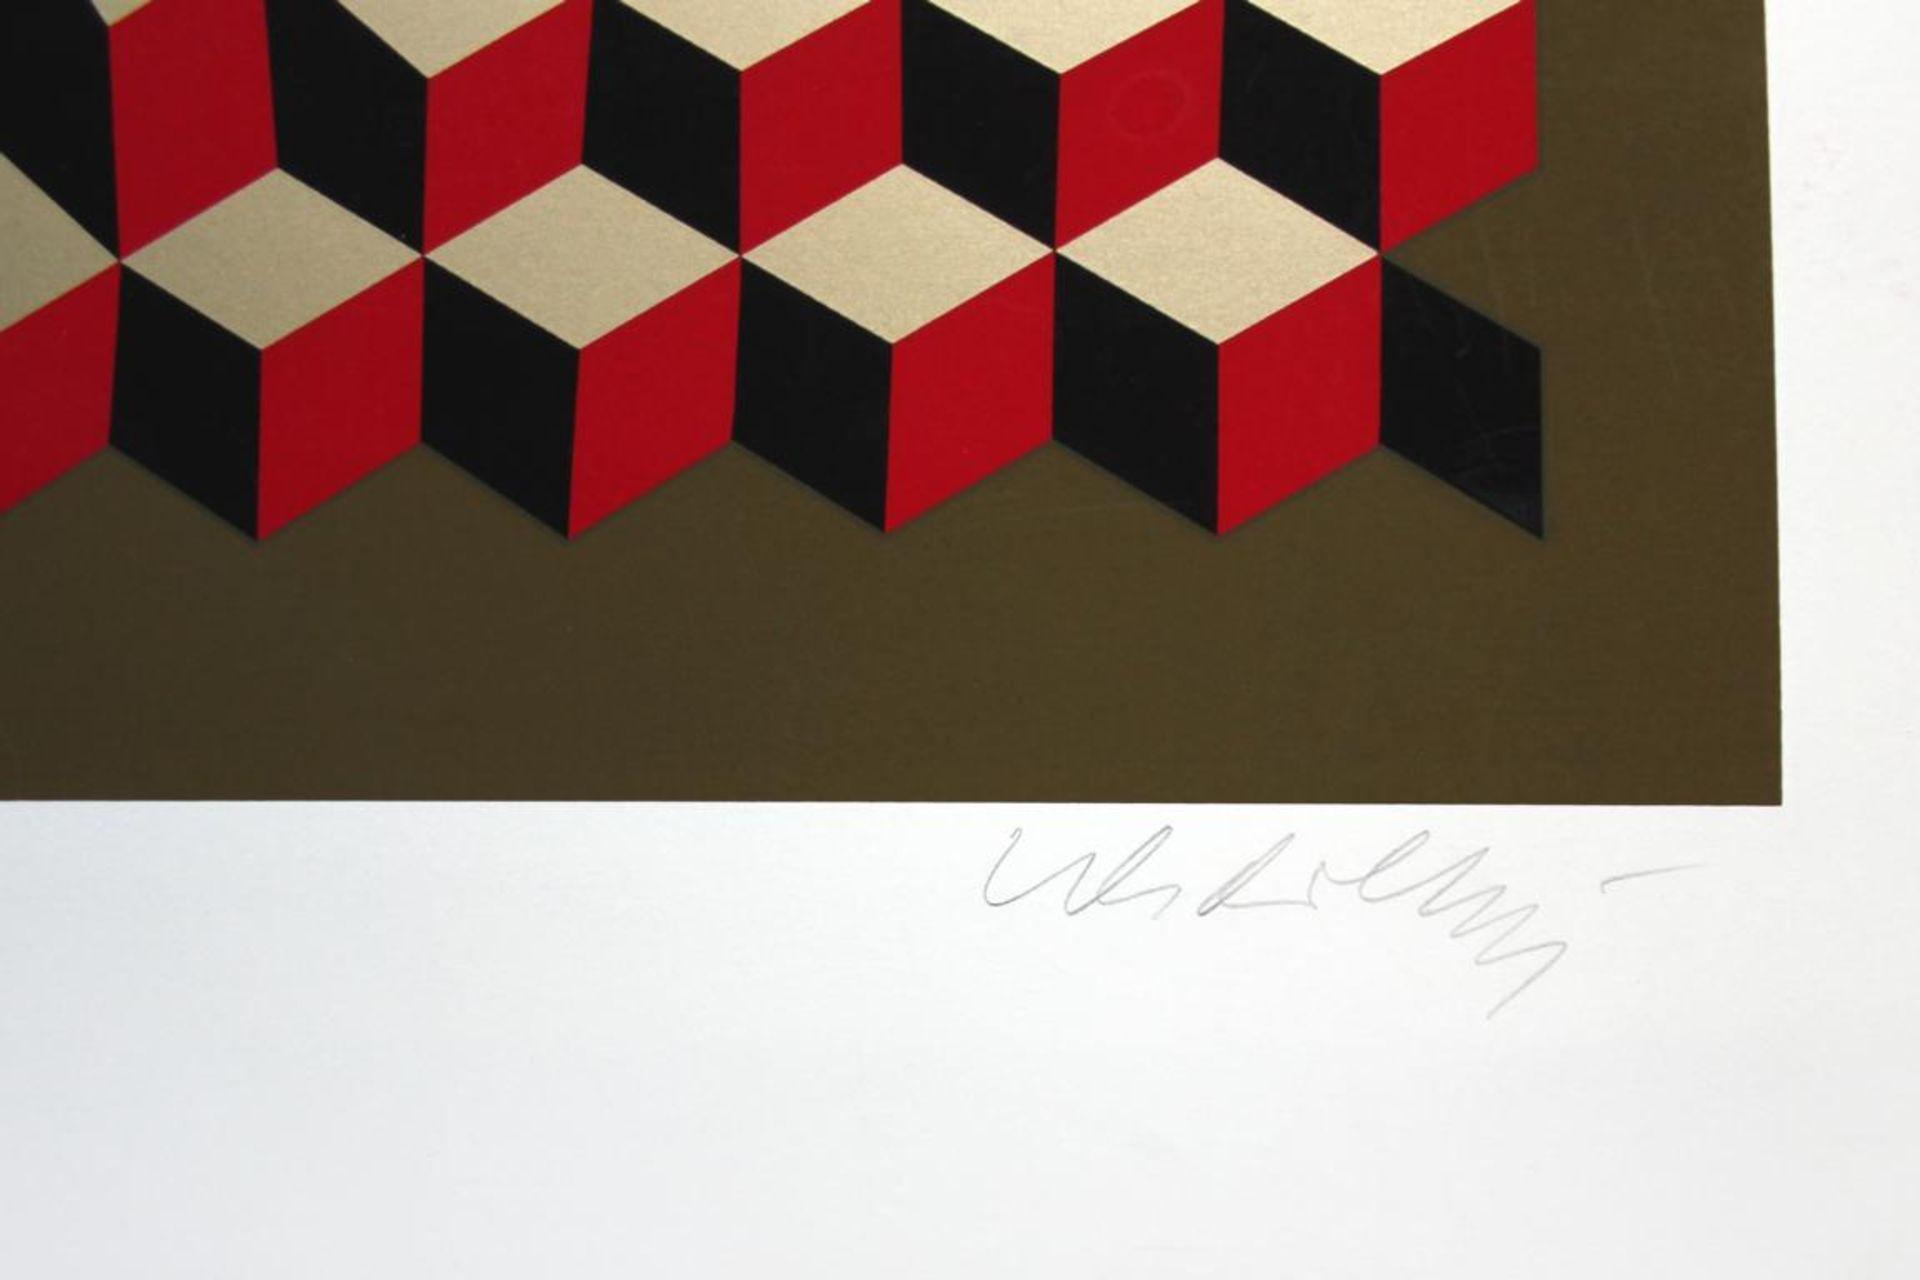 Los 22 - Vaserely Victor (1906-1997) VP-Cheyt 75 1975 Siebdruck handsigniert 117,5 x 64,5 cm